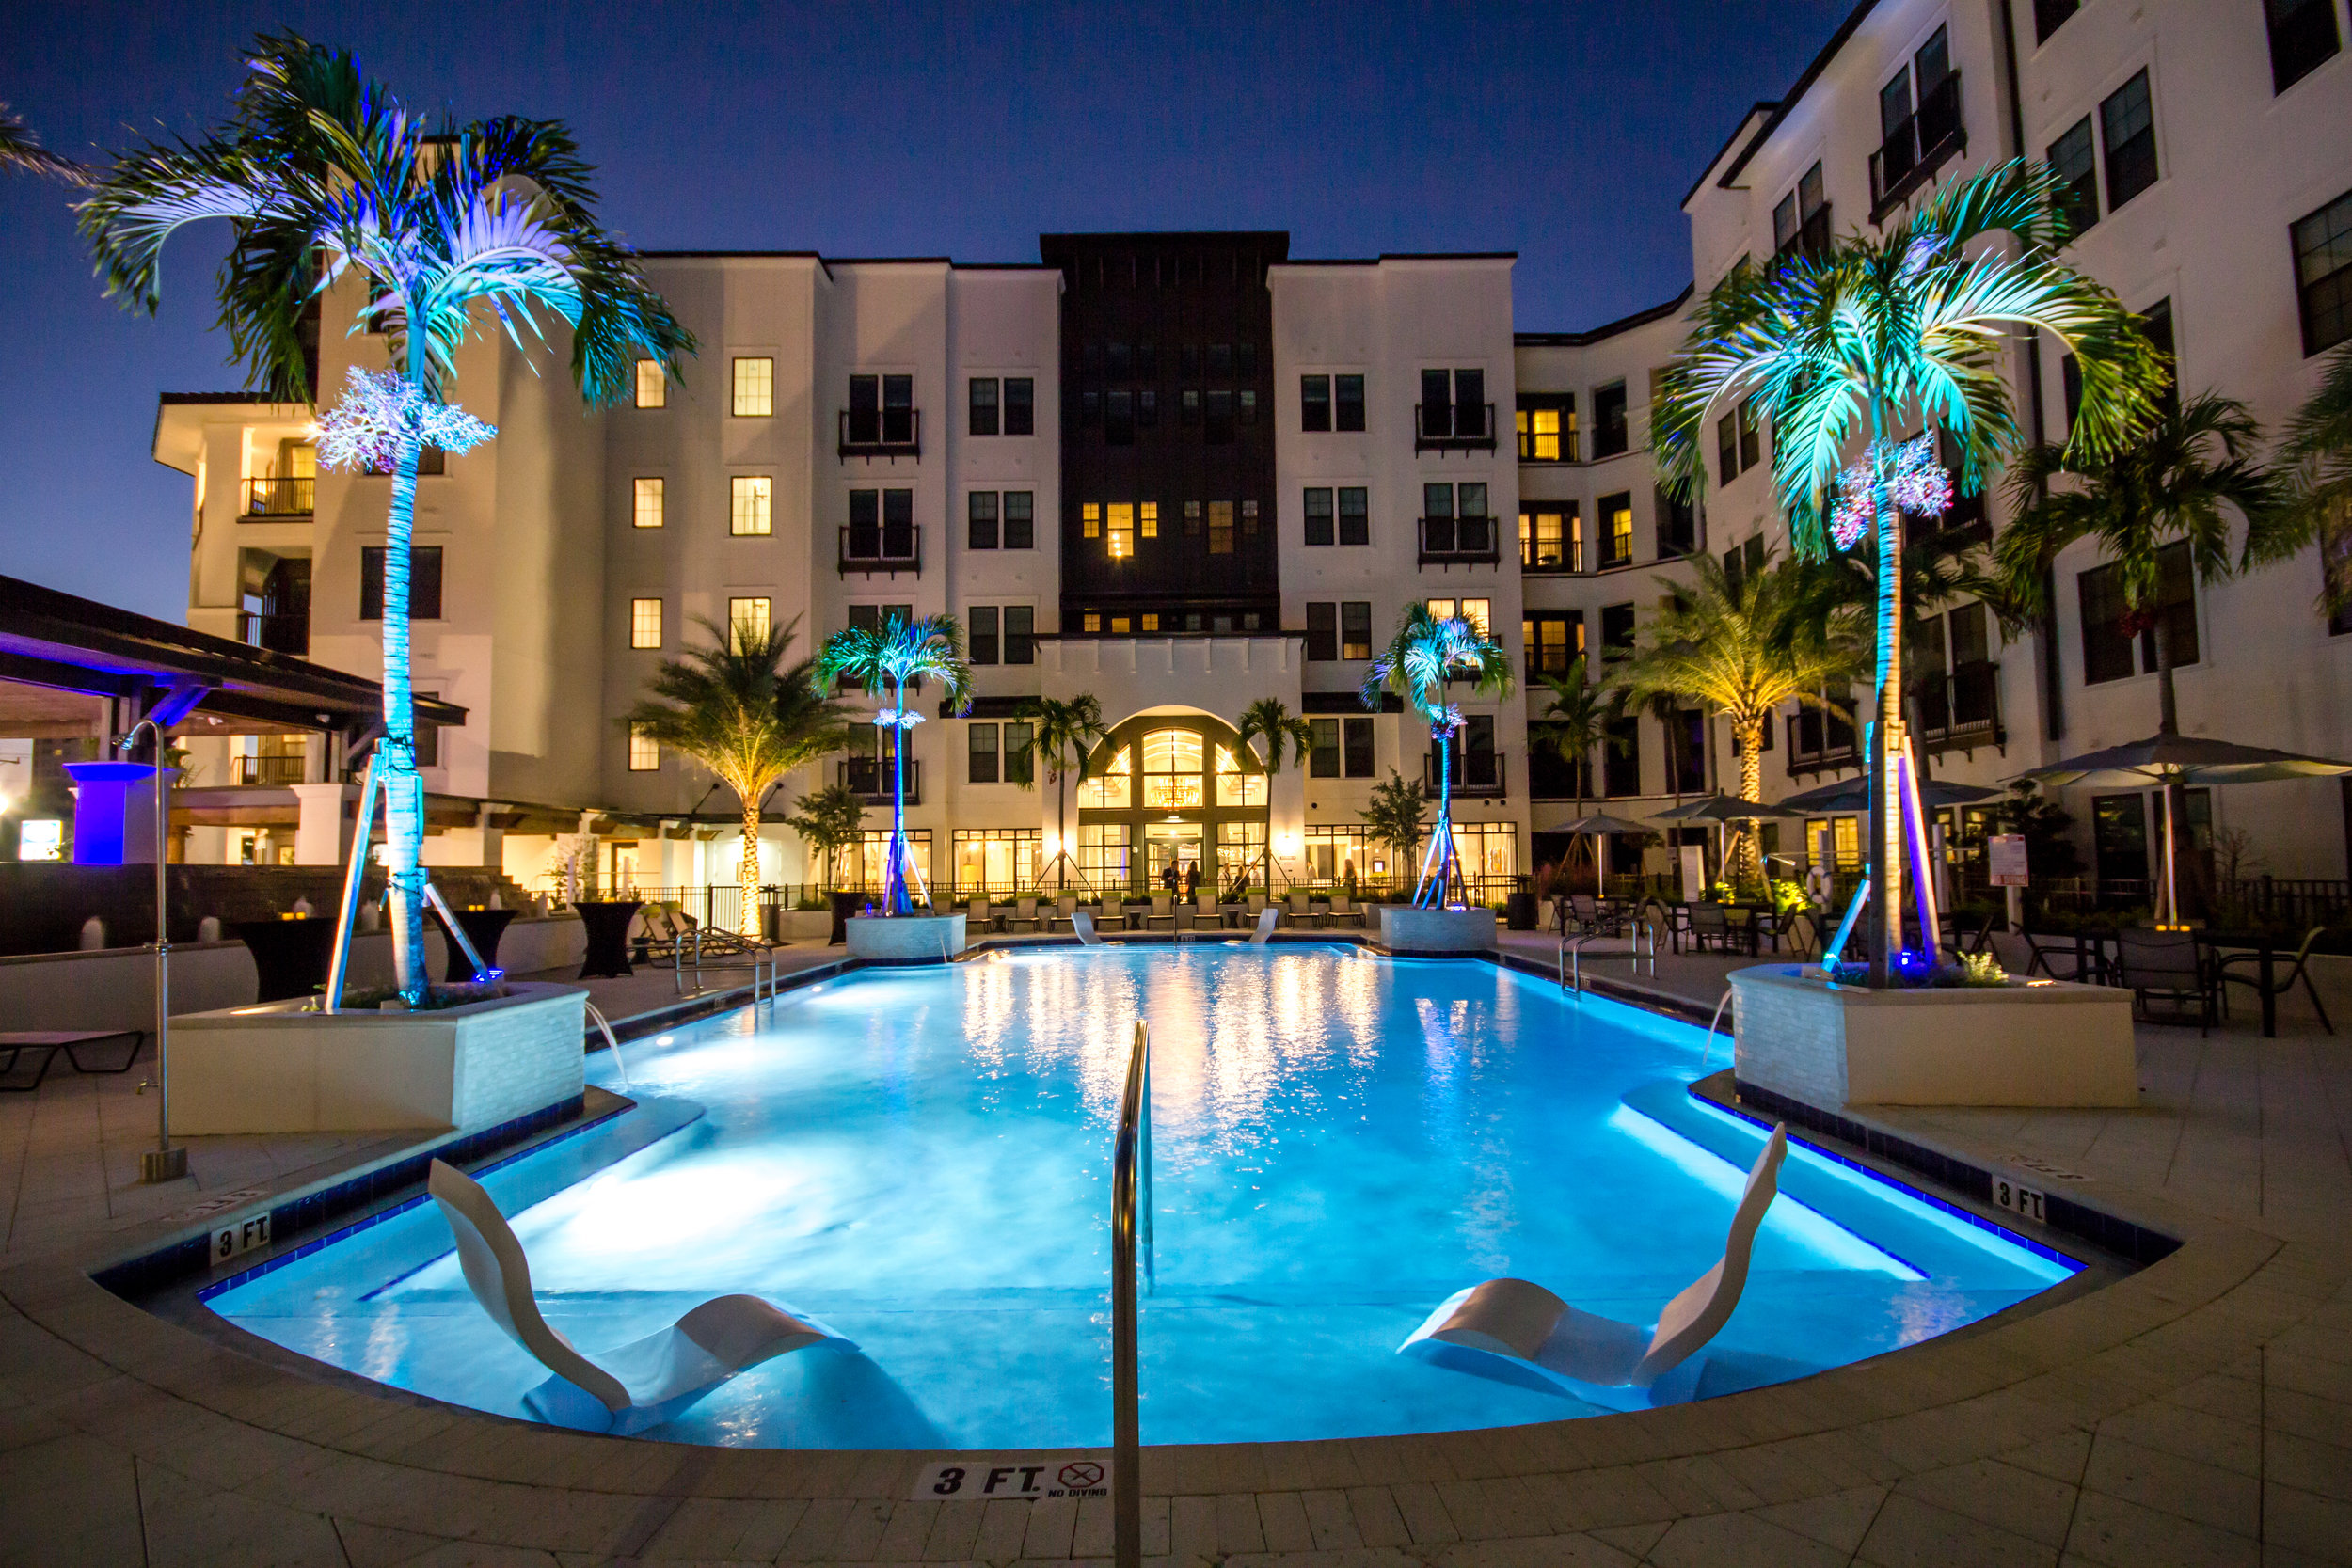 Arcos-apartments_GrandOpening-pool-03